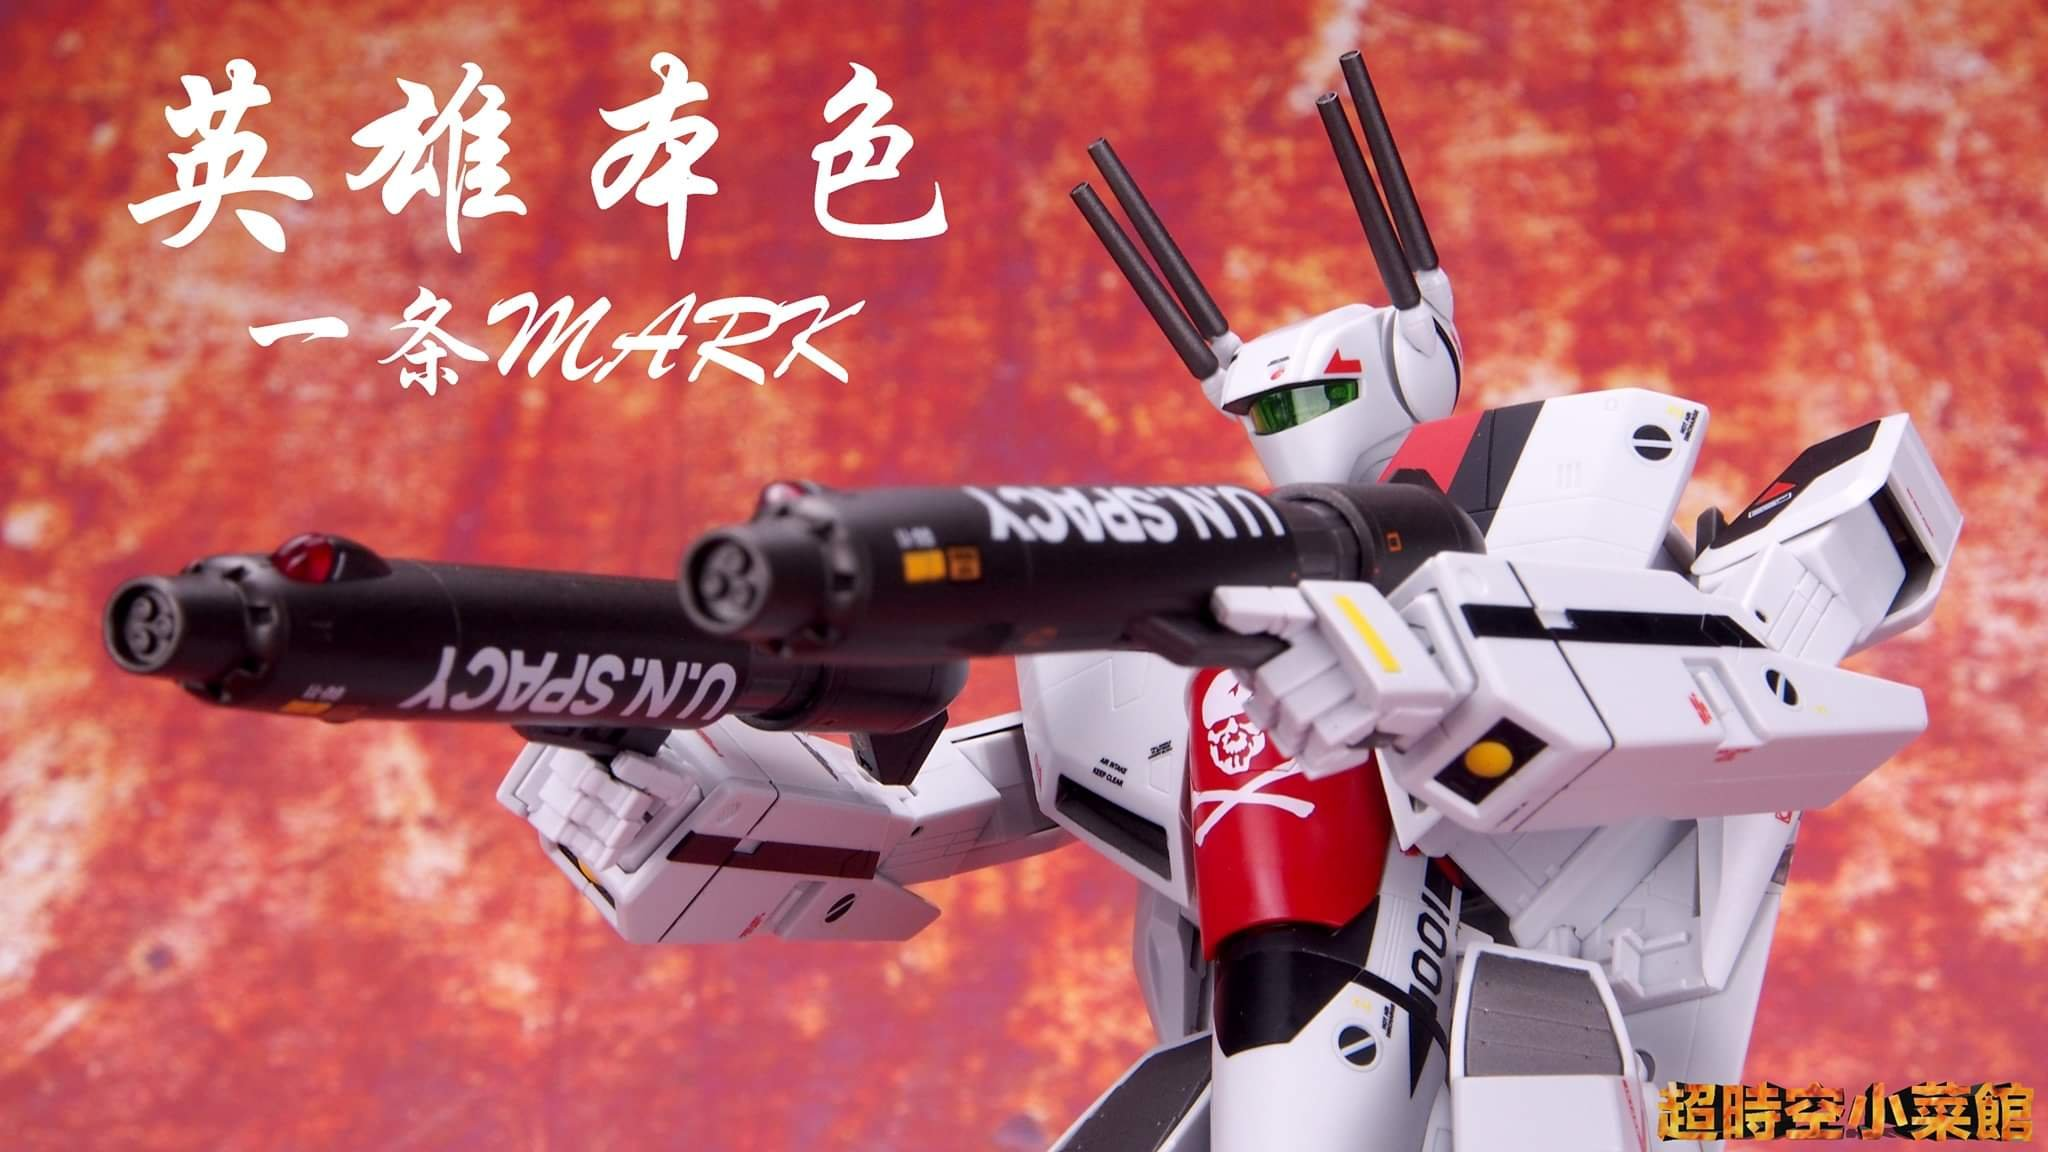 Bandai DX Chogokin 1/48 VF-1 - Page 105 - Toys - Macross